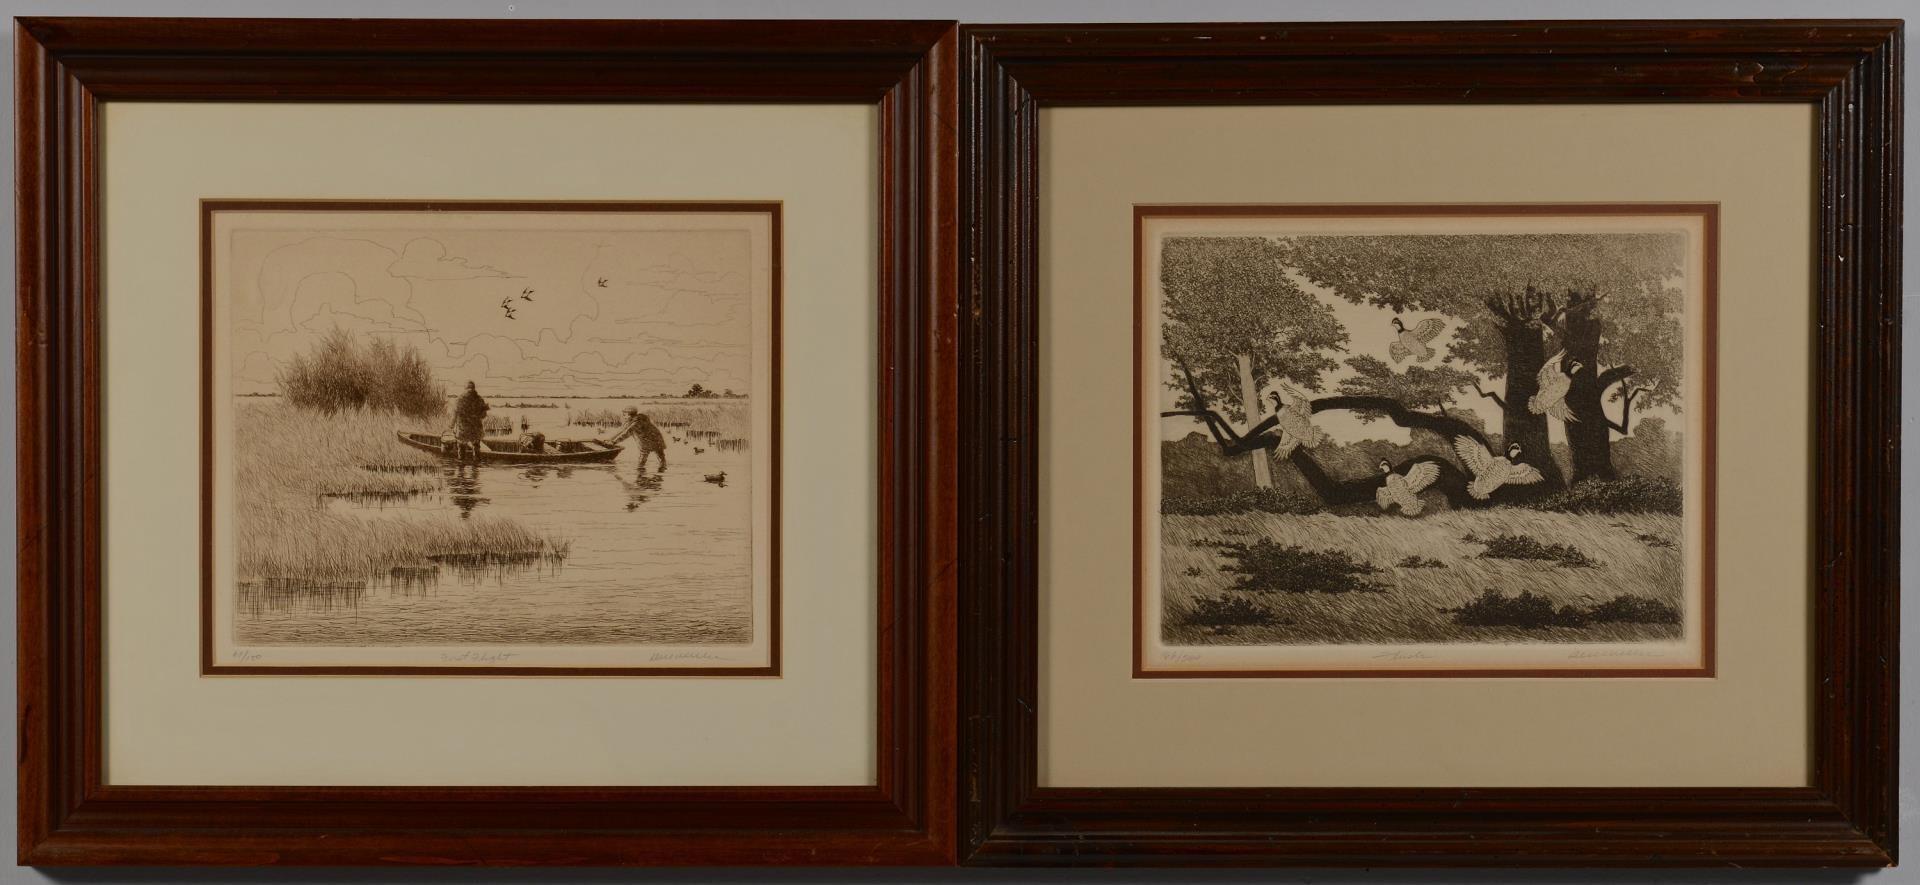 Lot 3594280: 2 Dell Weller Duck Hunt Prints